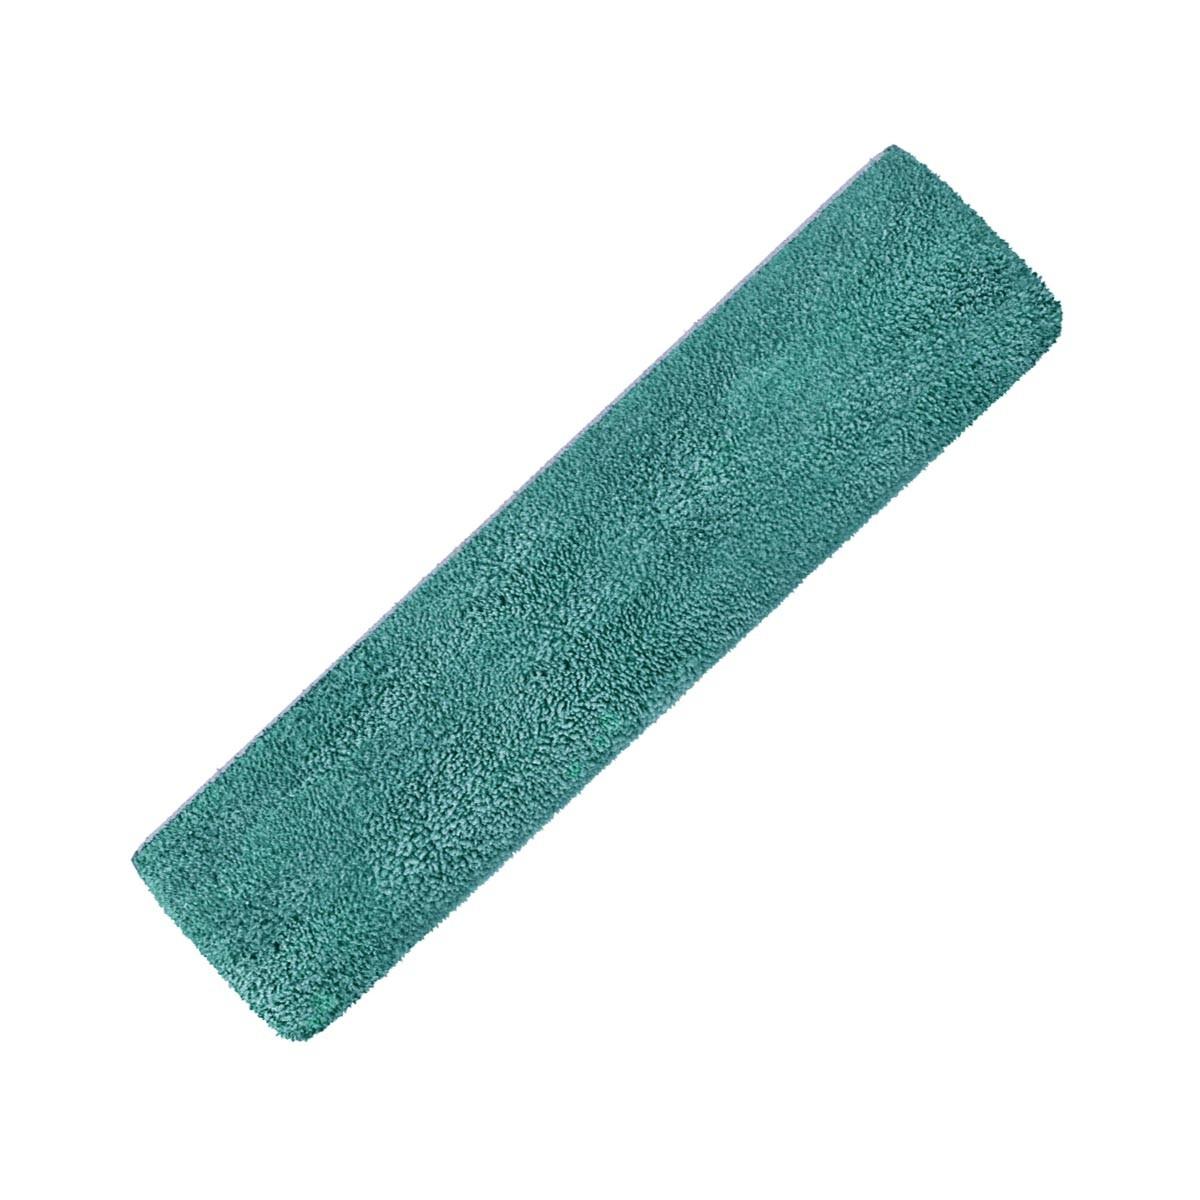 Refil Flash Limp Para Limpa Vidros Extensível RFLP6391